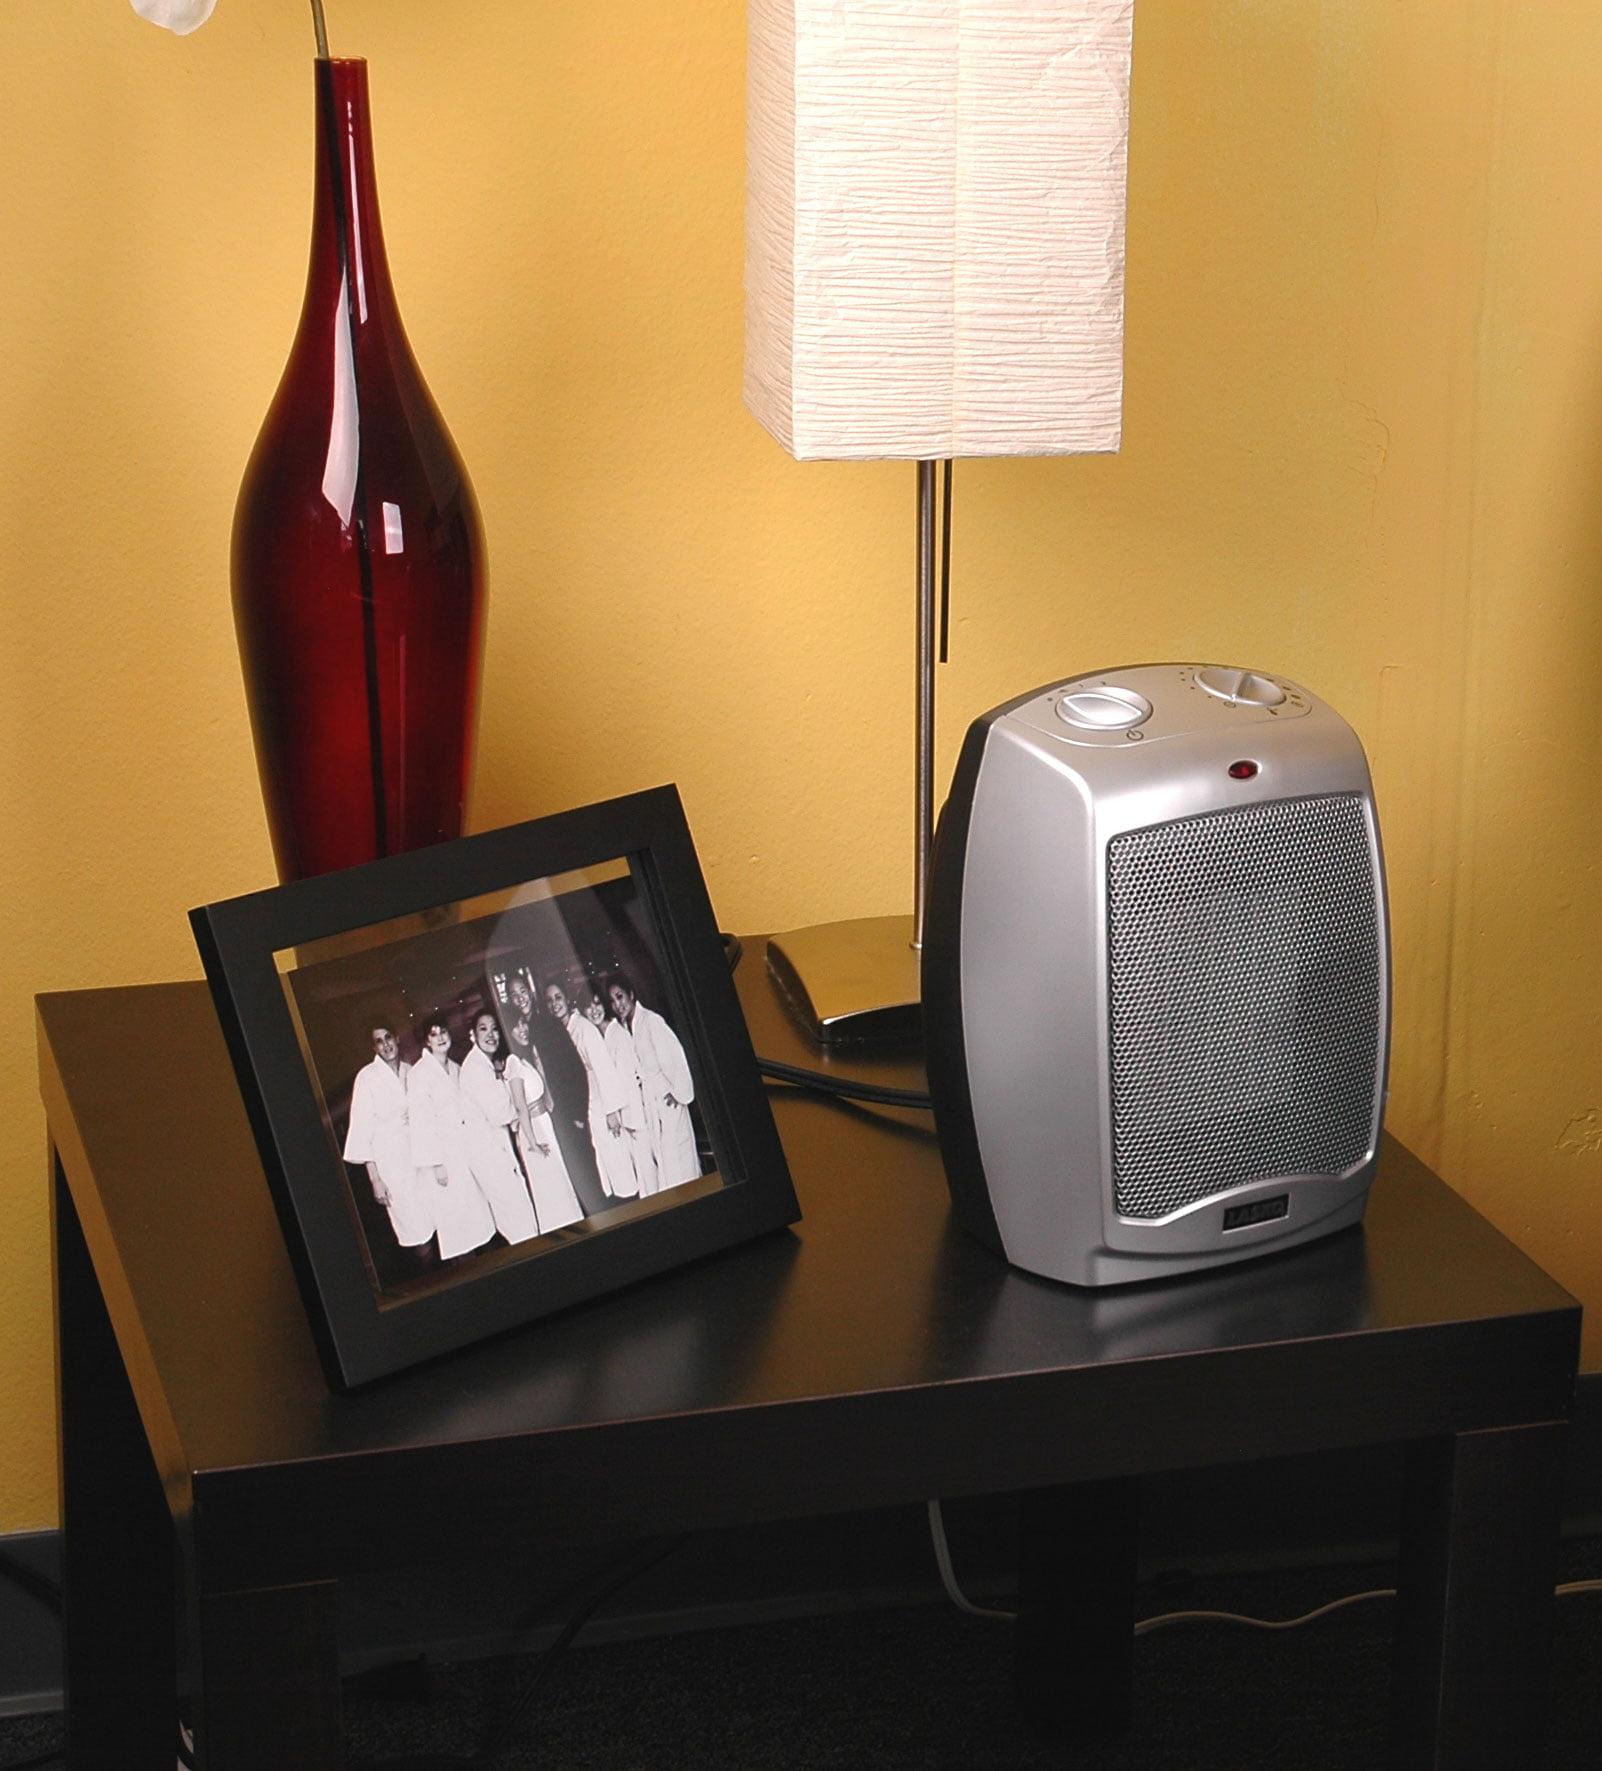 lasko electric ceramic 1500w heater silverblack 2 pack walmartcom